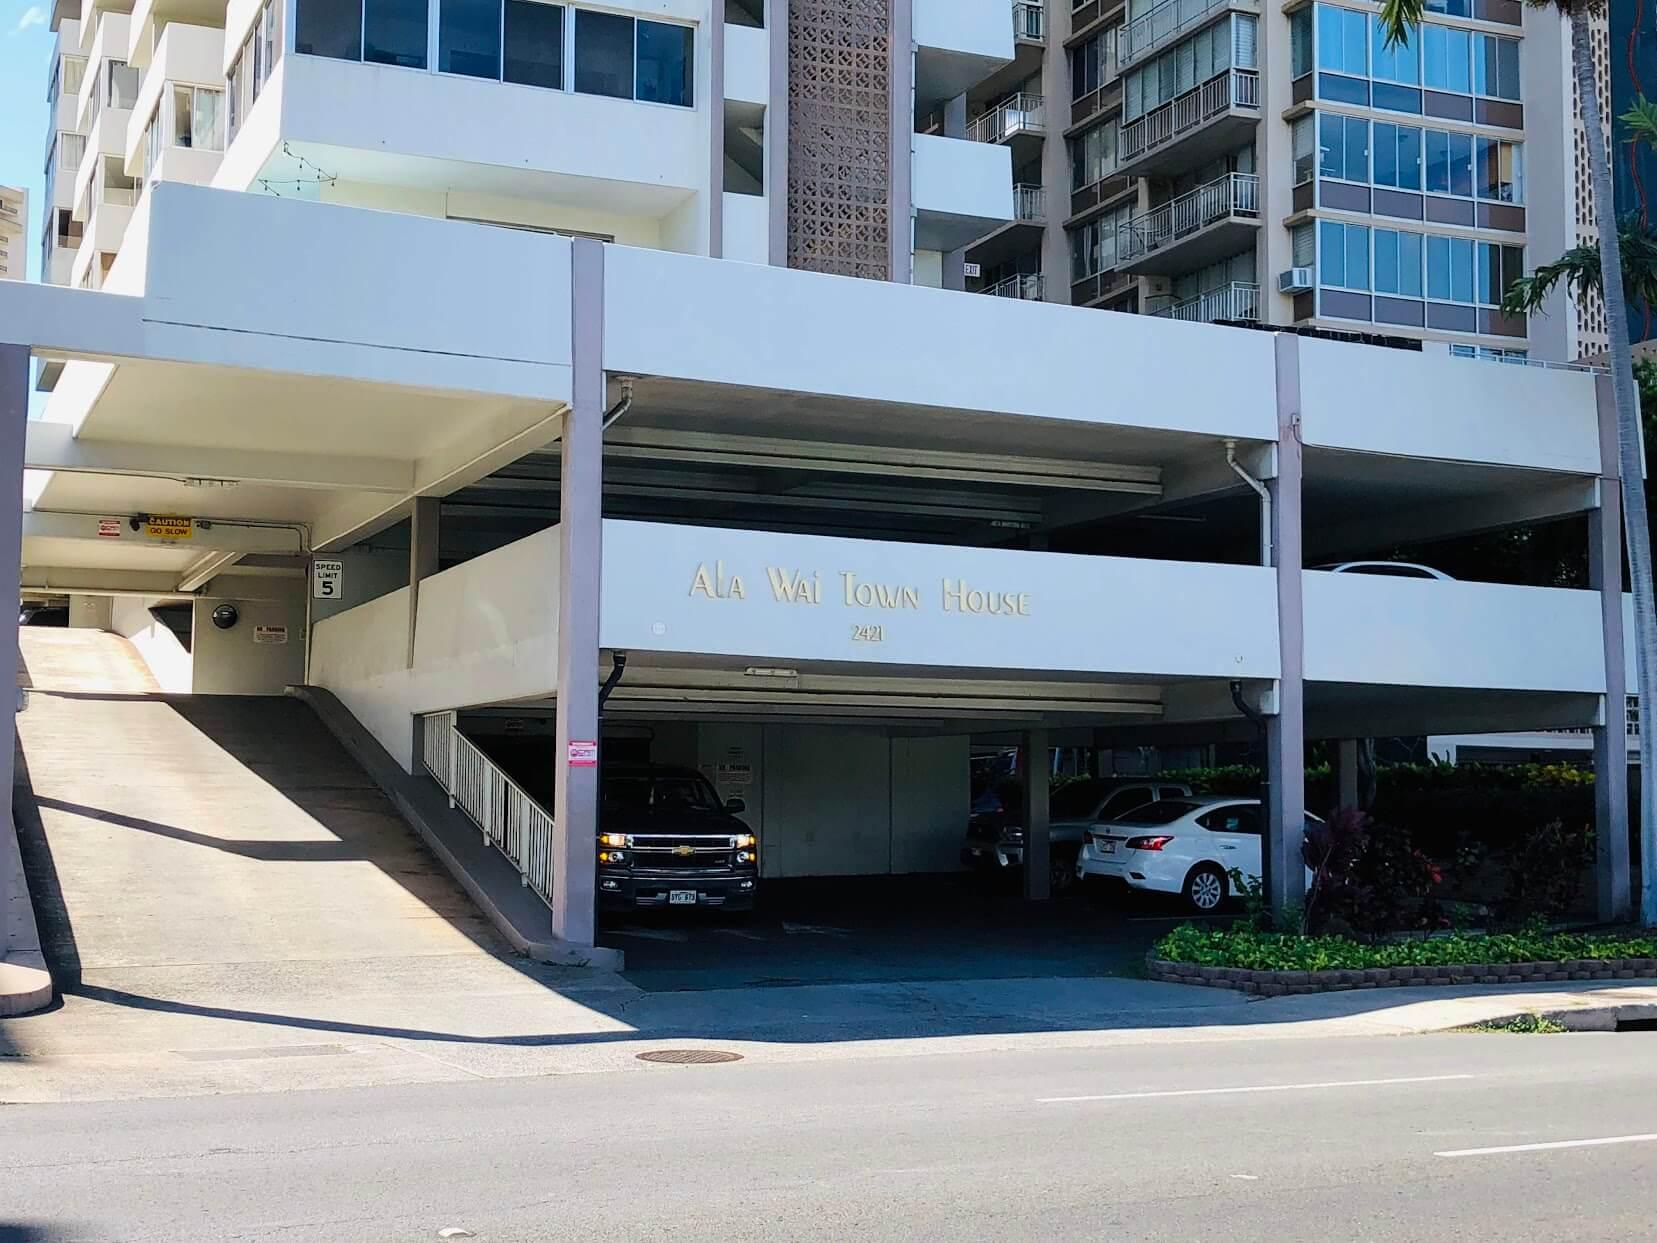 Ala Wai Town Houseの駐車場